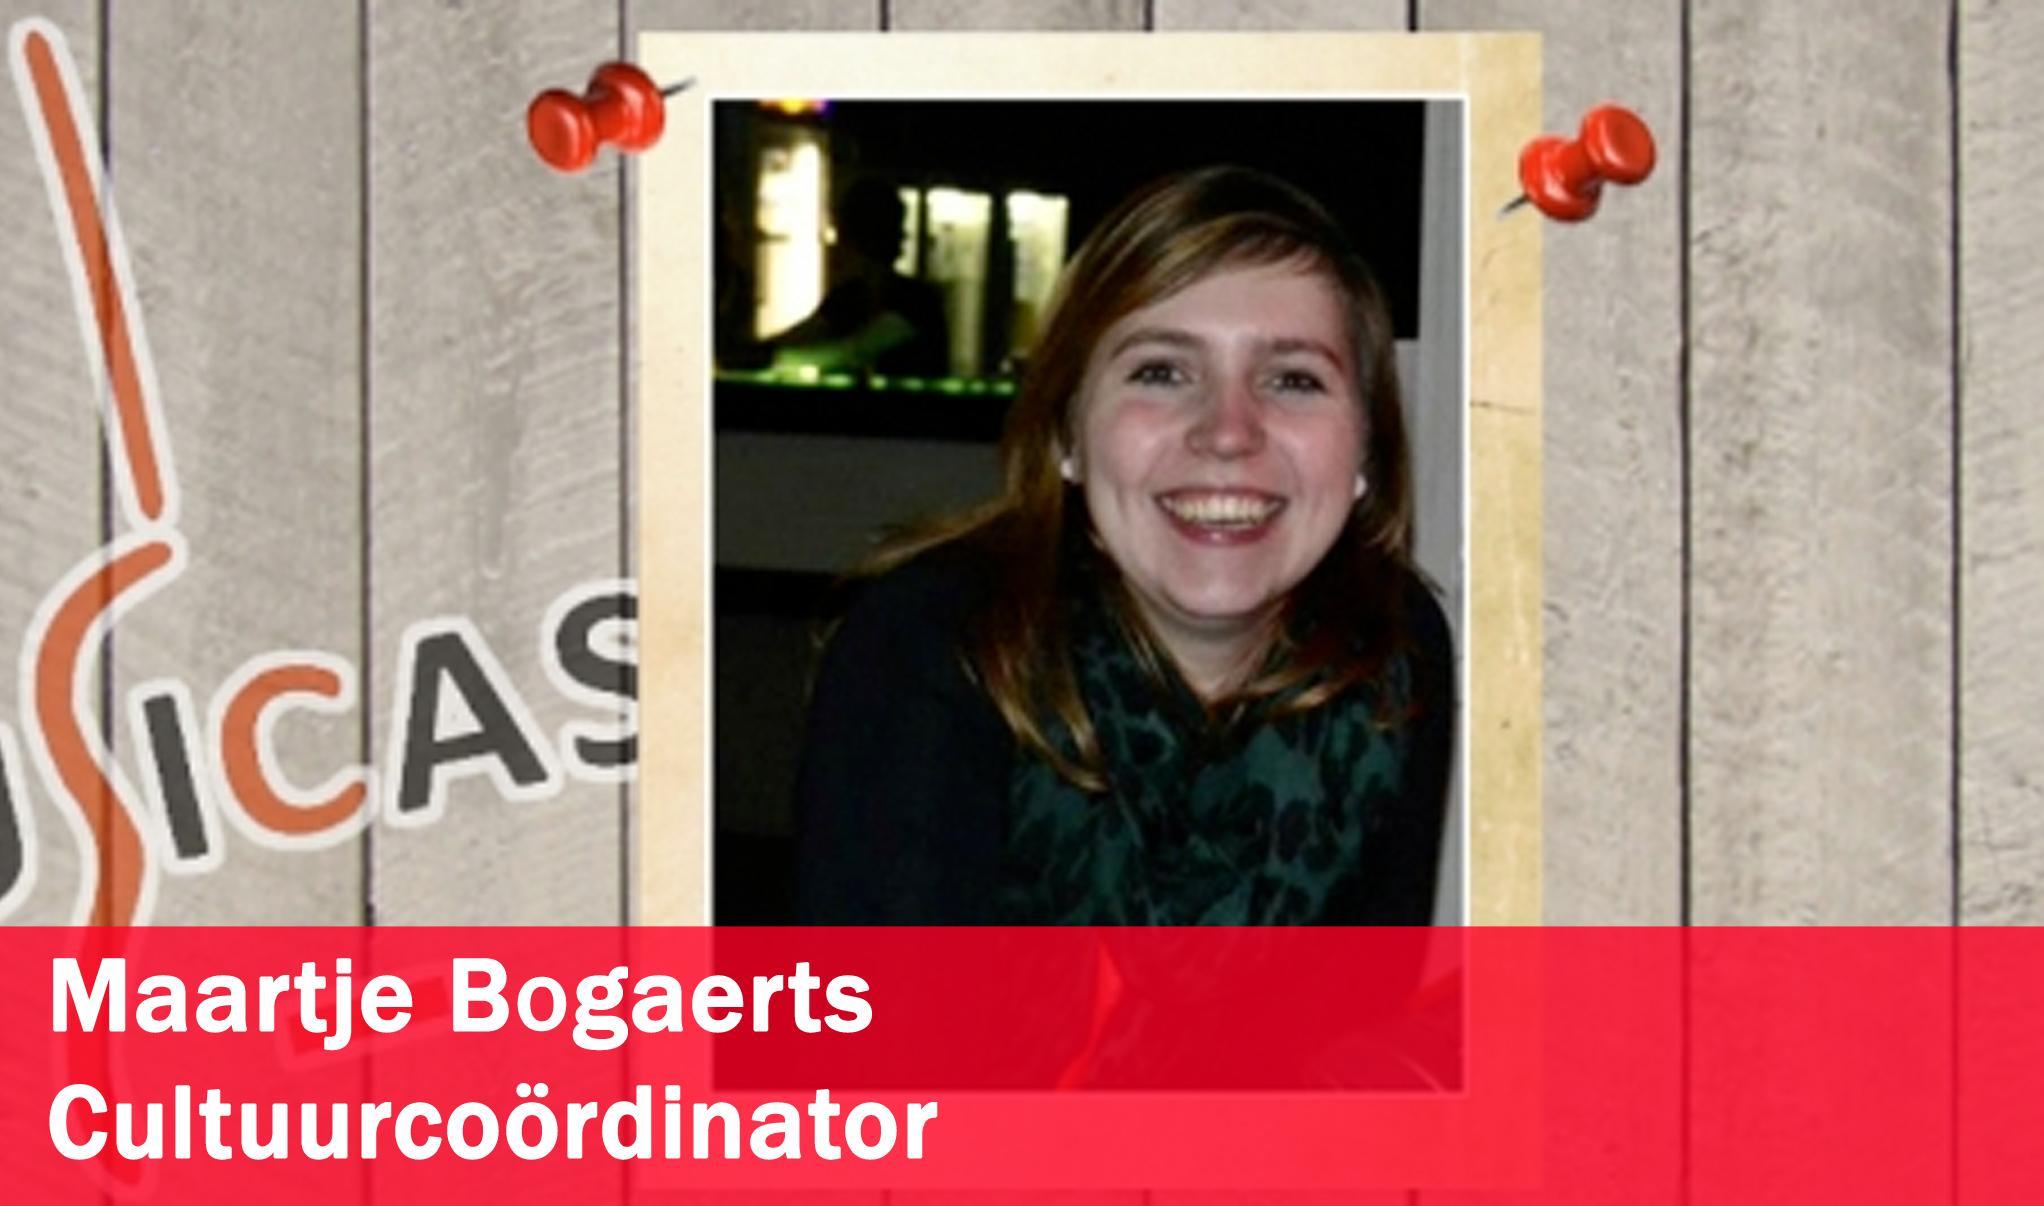 Maartje Bogaerts <br>Cultuurcoördinator